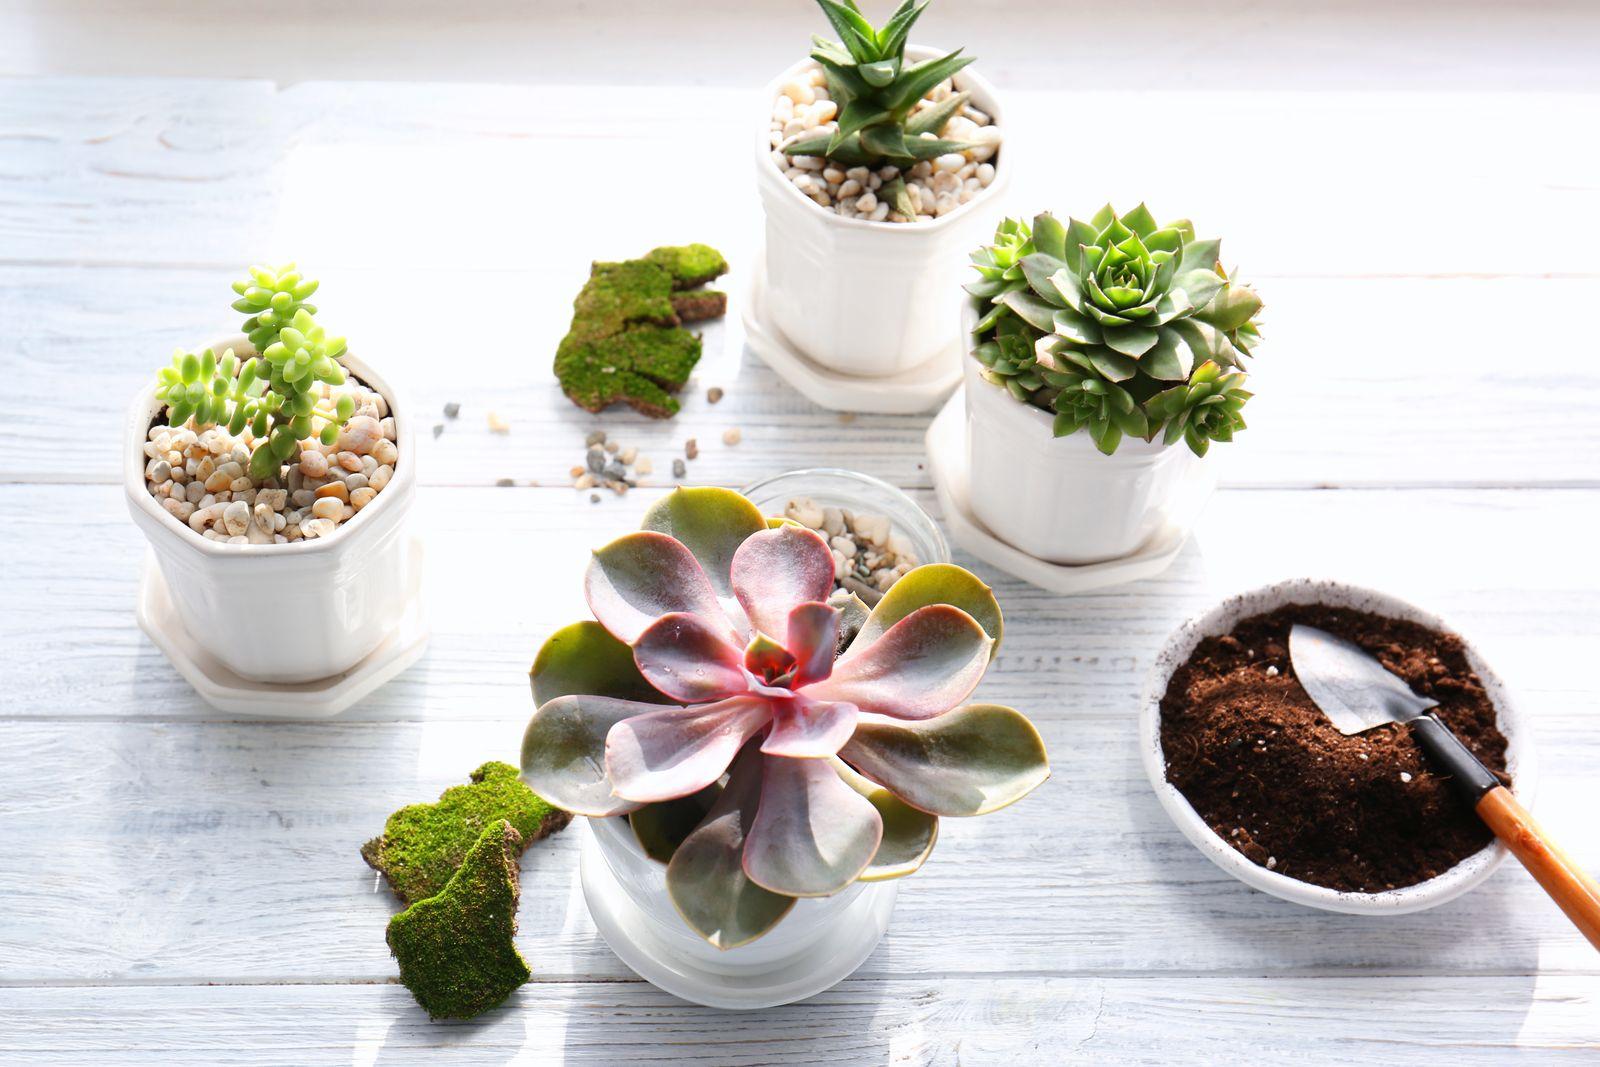 Kakteen& Sukkulenten richtig pflegen Die 5 besten Tipps Plantura ~ 23202556_Sukkulenten Im Winter Umtopfen